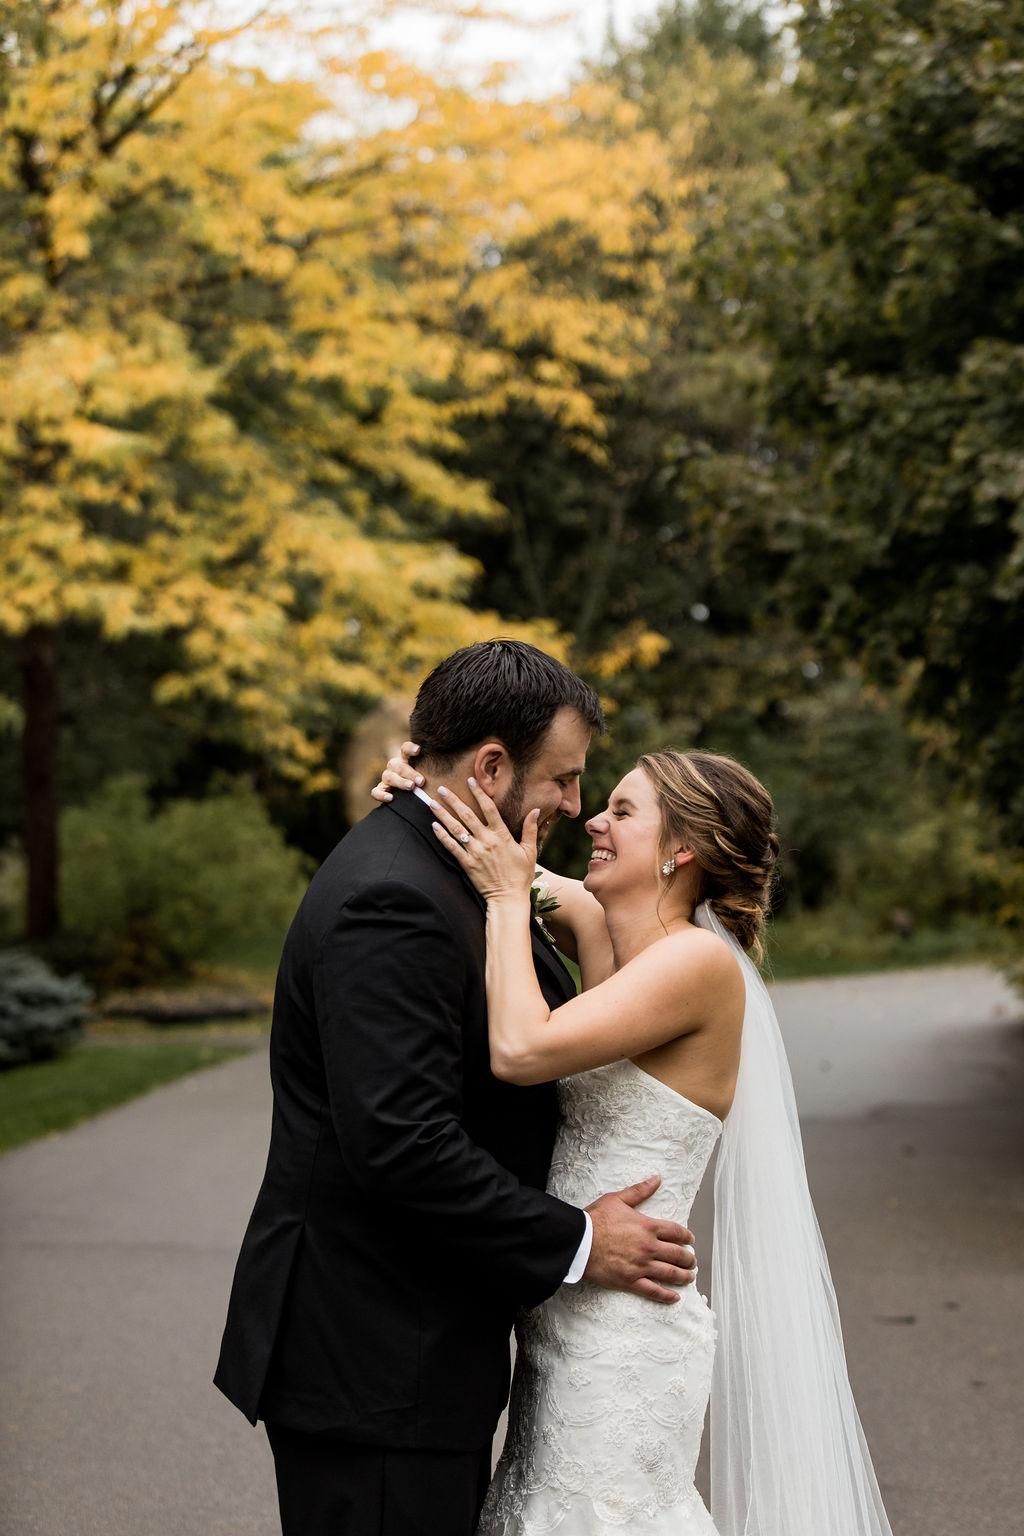 best_midwest_wedding_photographer_JMH_photography-43.jpg